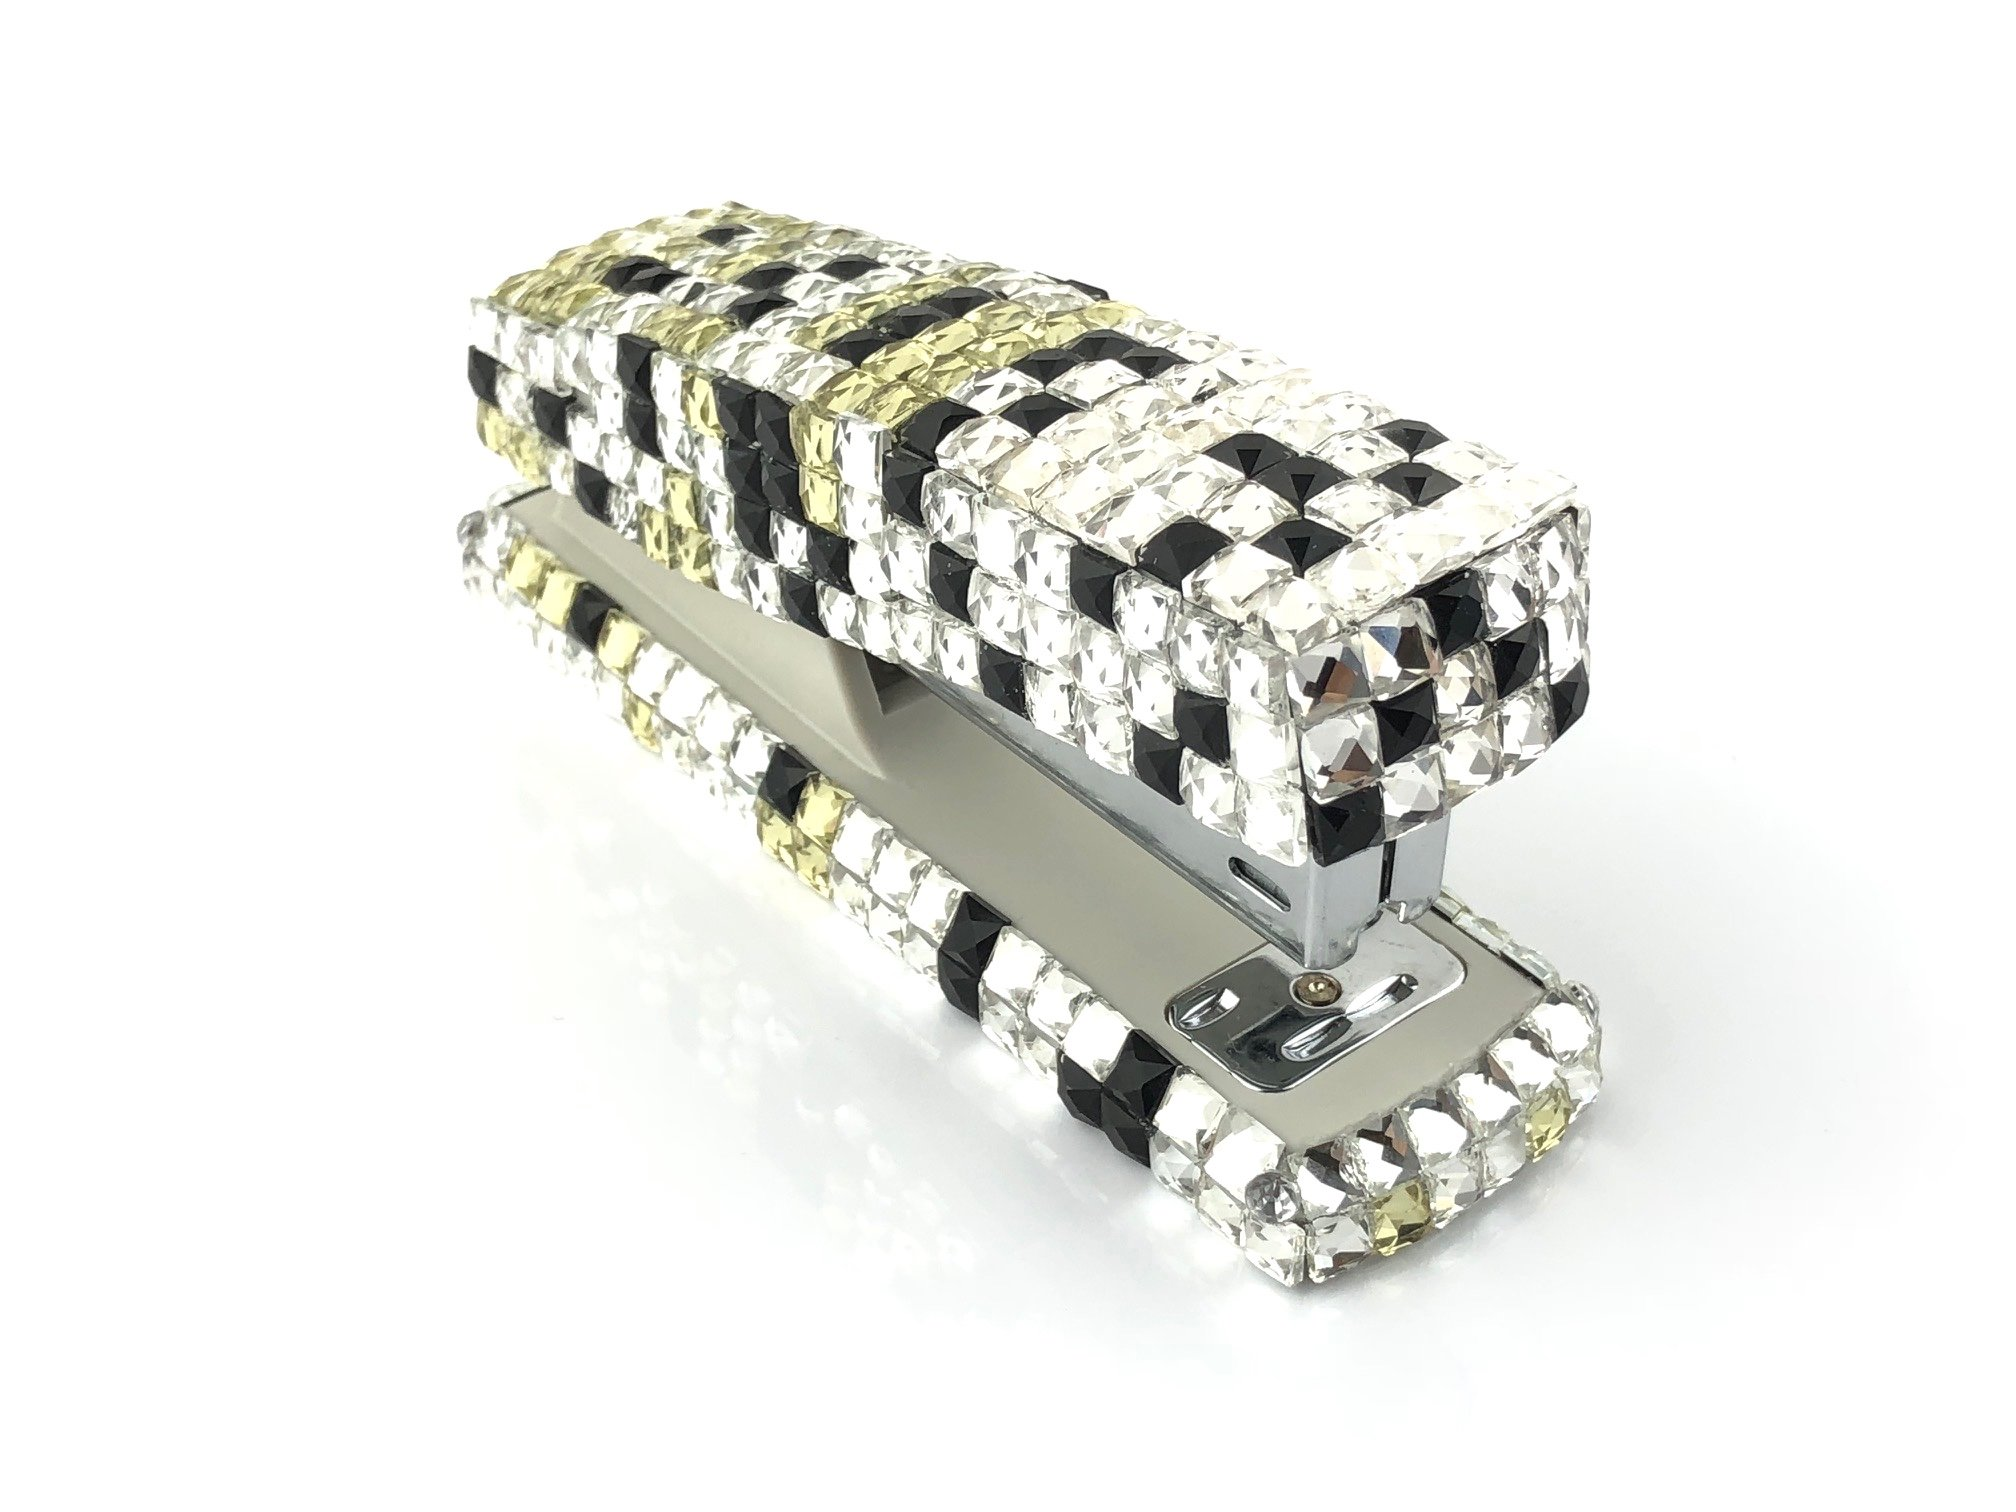 Blingustyle Bling Bling Iridescent Sparkly Square Swarovski Elements Crystal Stapler for Office/Home Gift